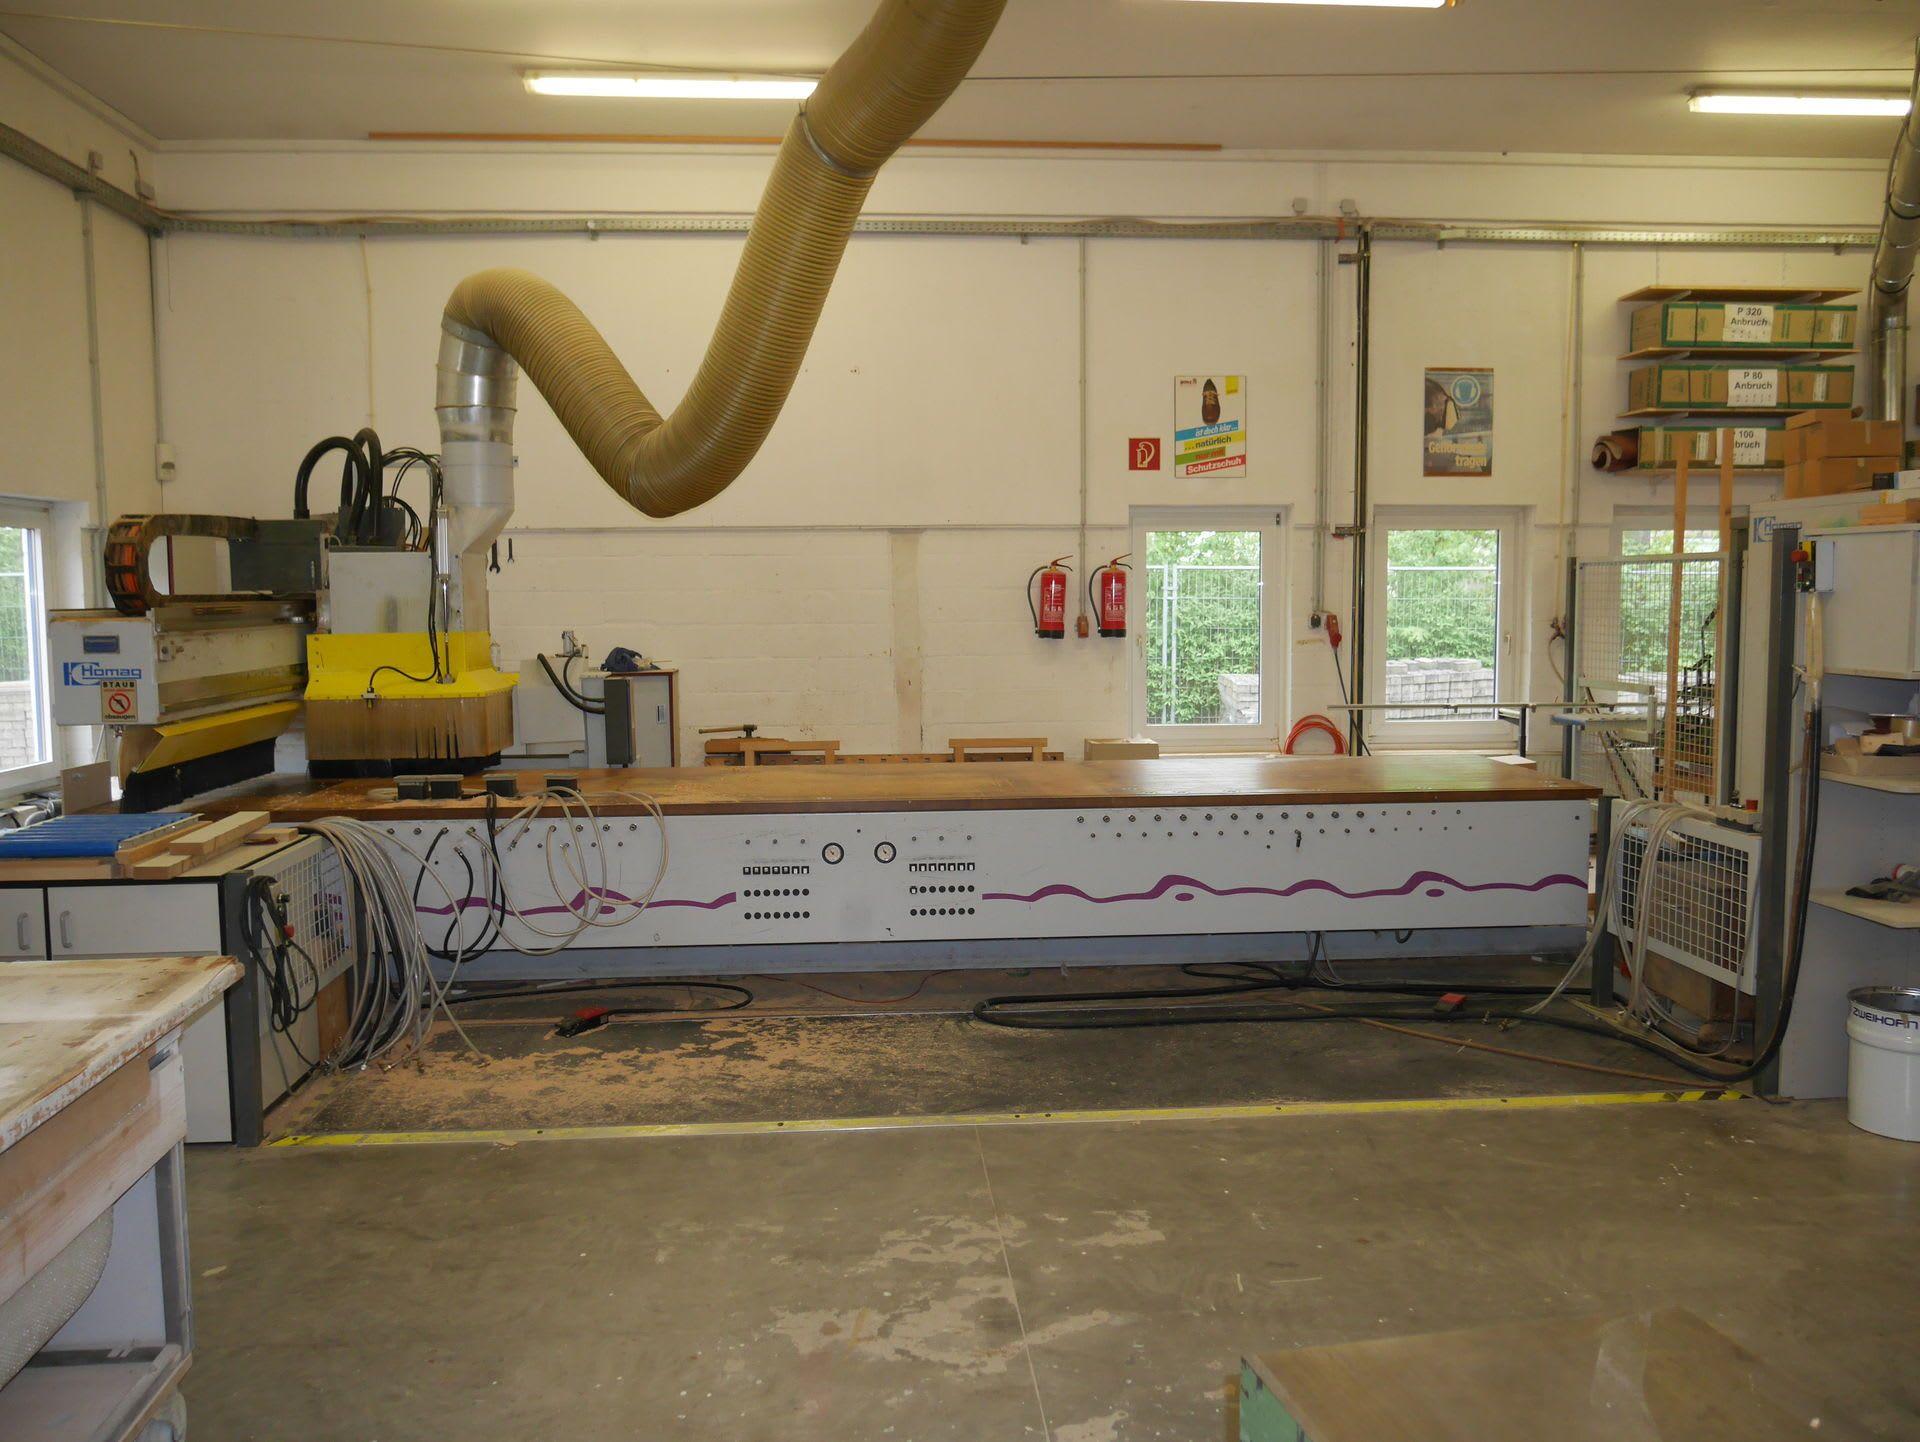 HOMAG BAZ 31 CNC-Bearbeitungszentrum